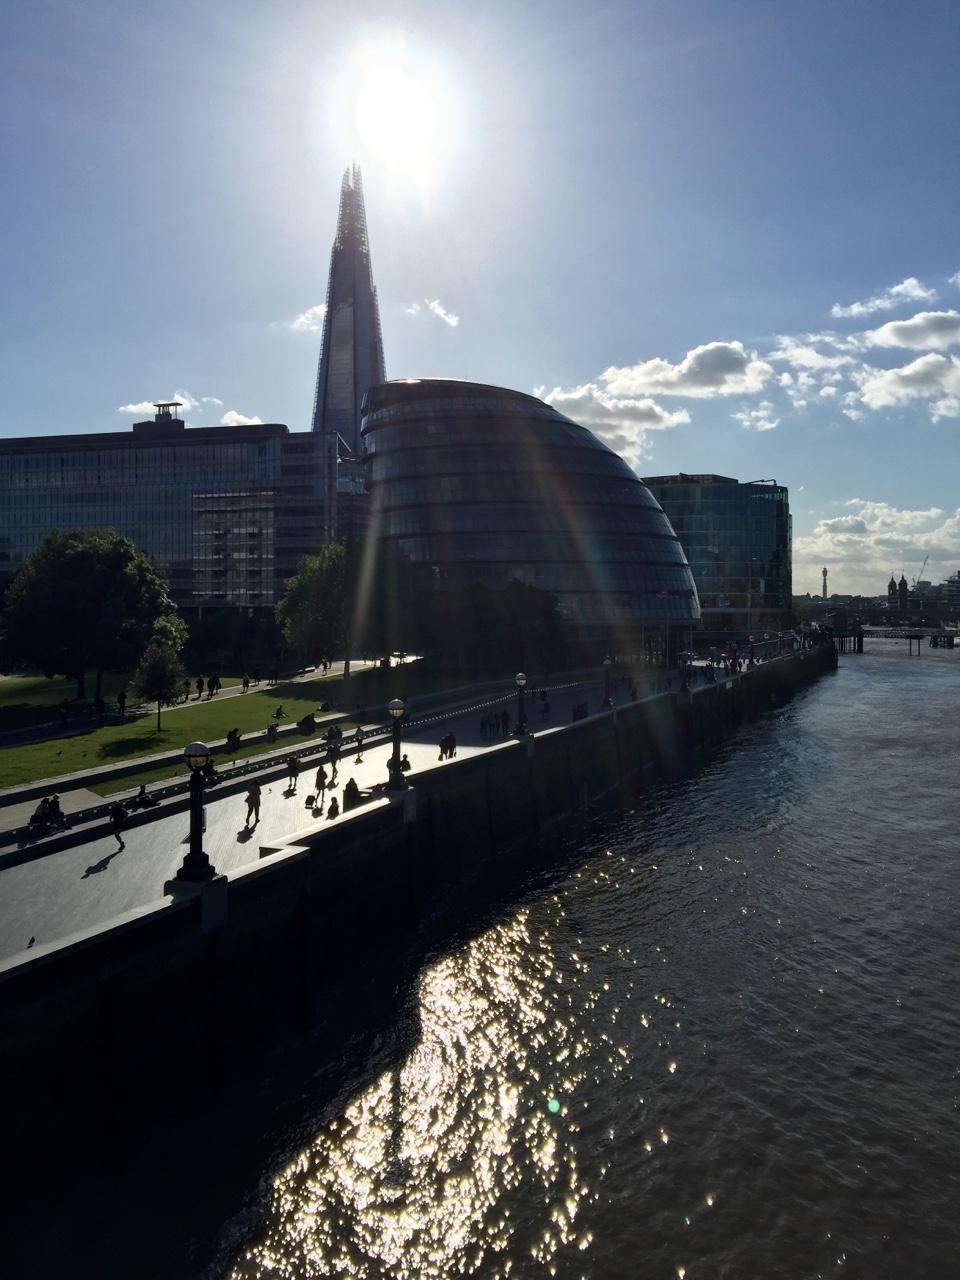 View from Tower Bridge - London, United Kingdom